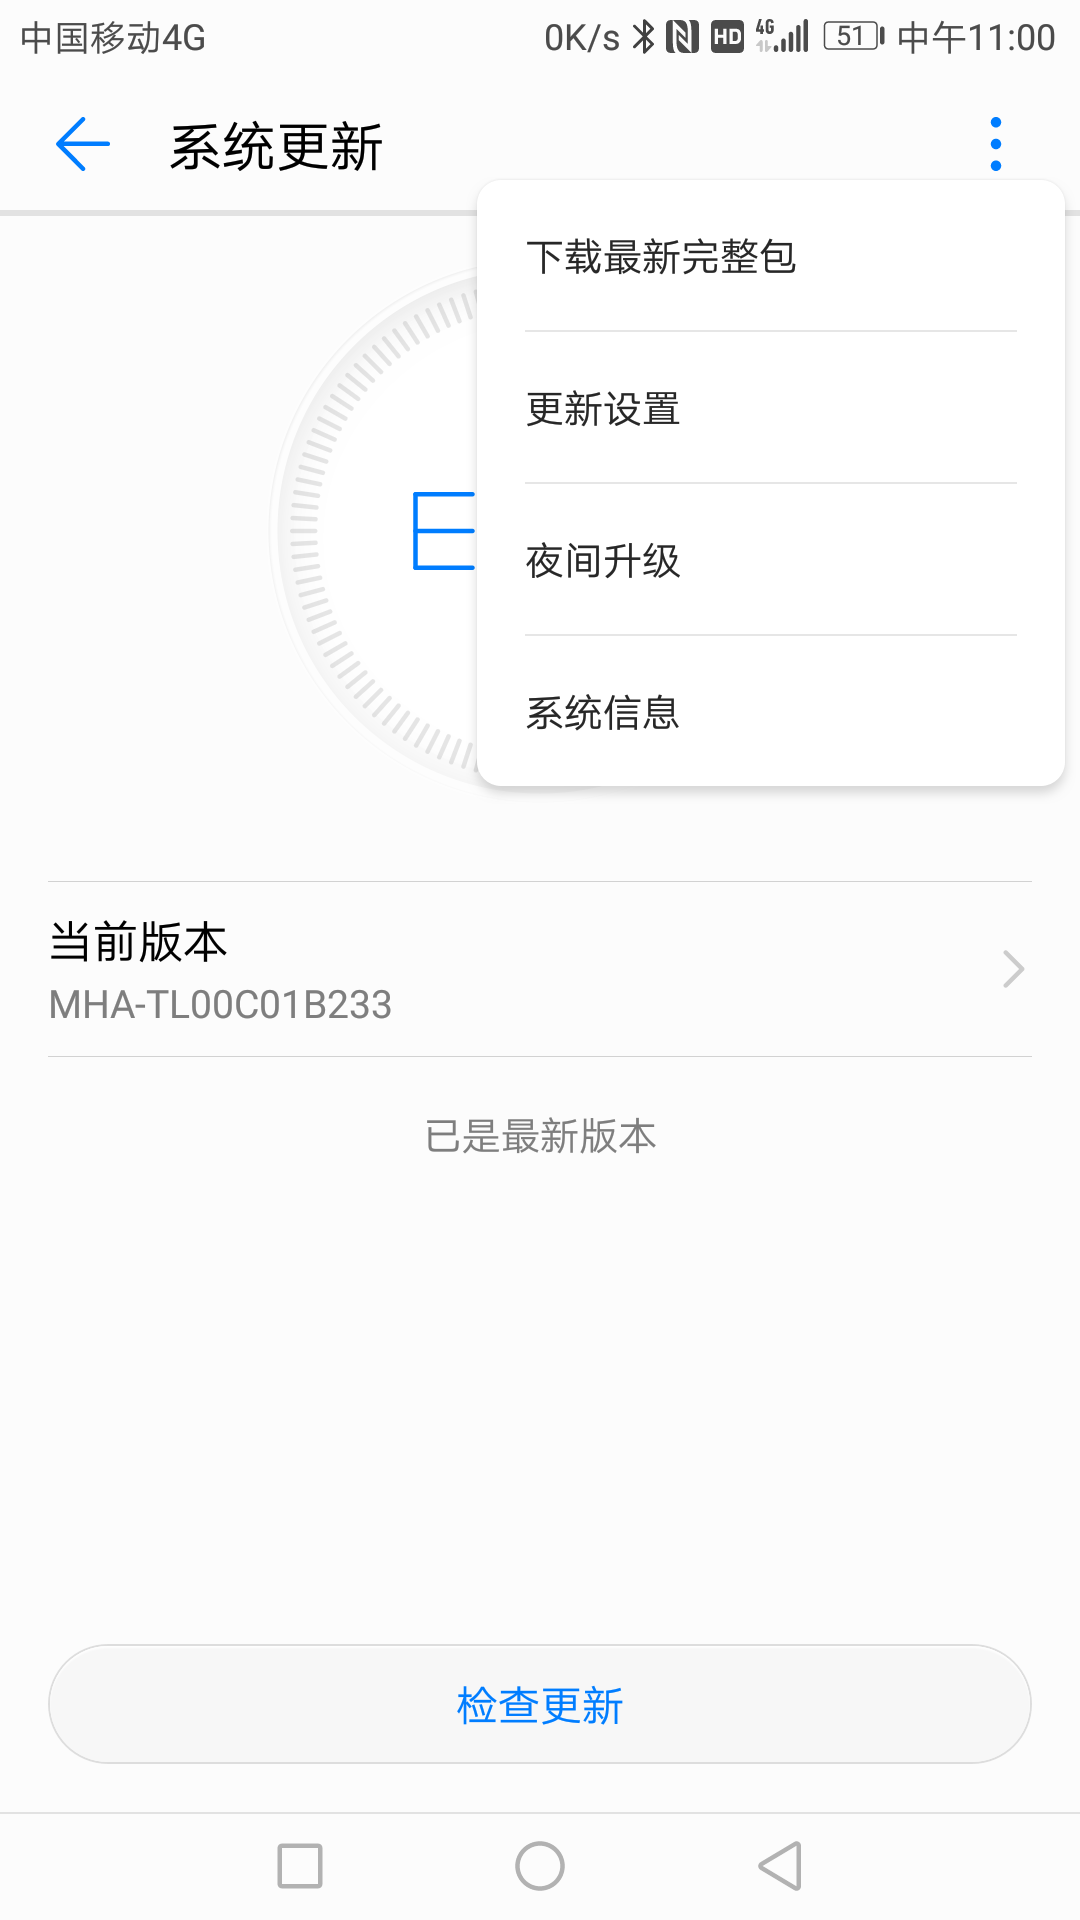 Screenshot_20200514-110008.png